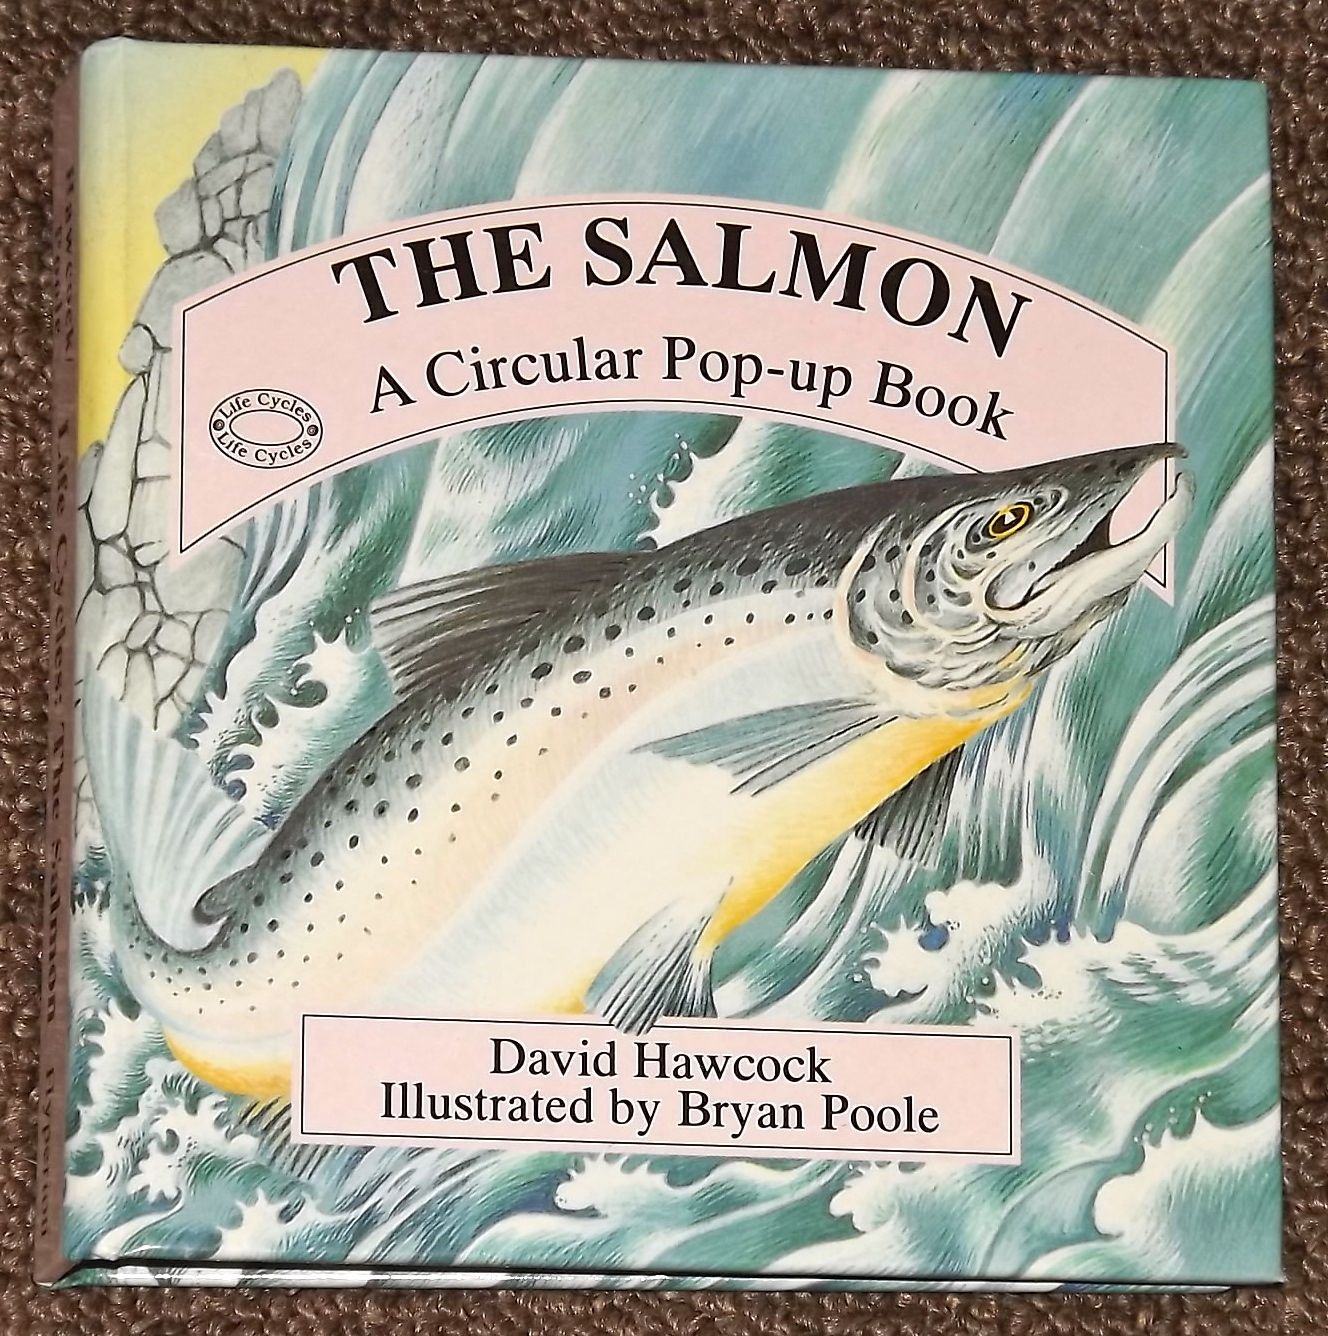 The Salmon A Circular Pop-Up Book by David Hawcock 1995